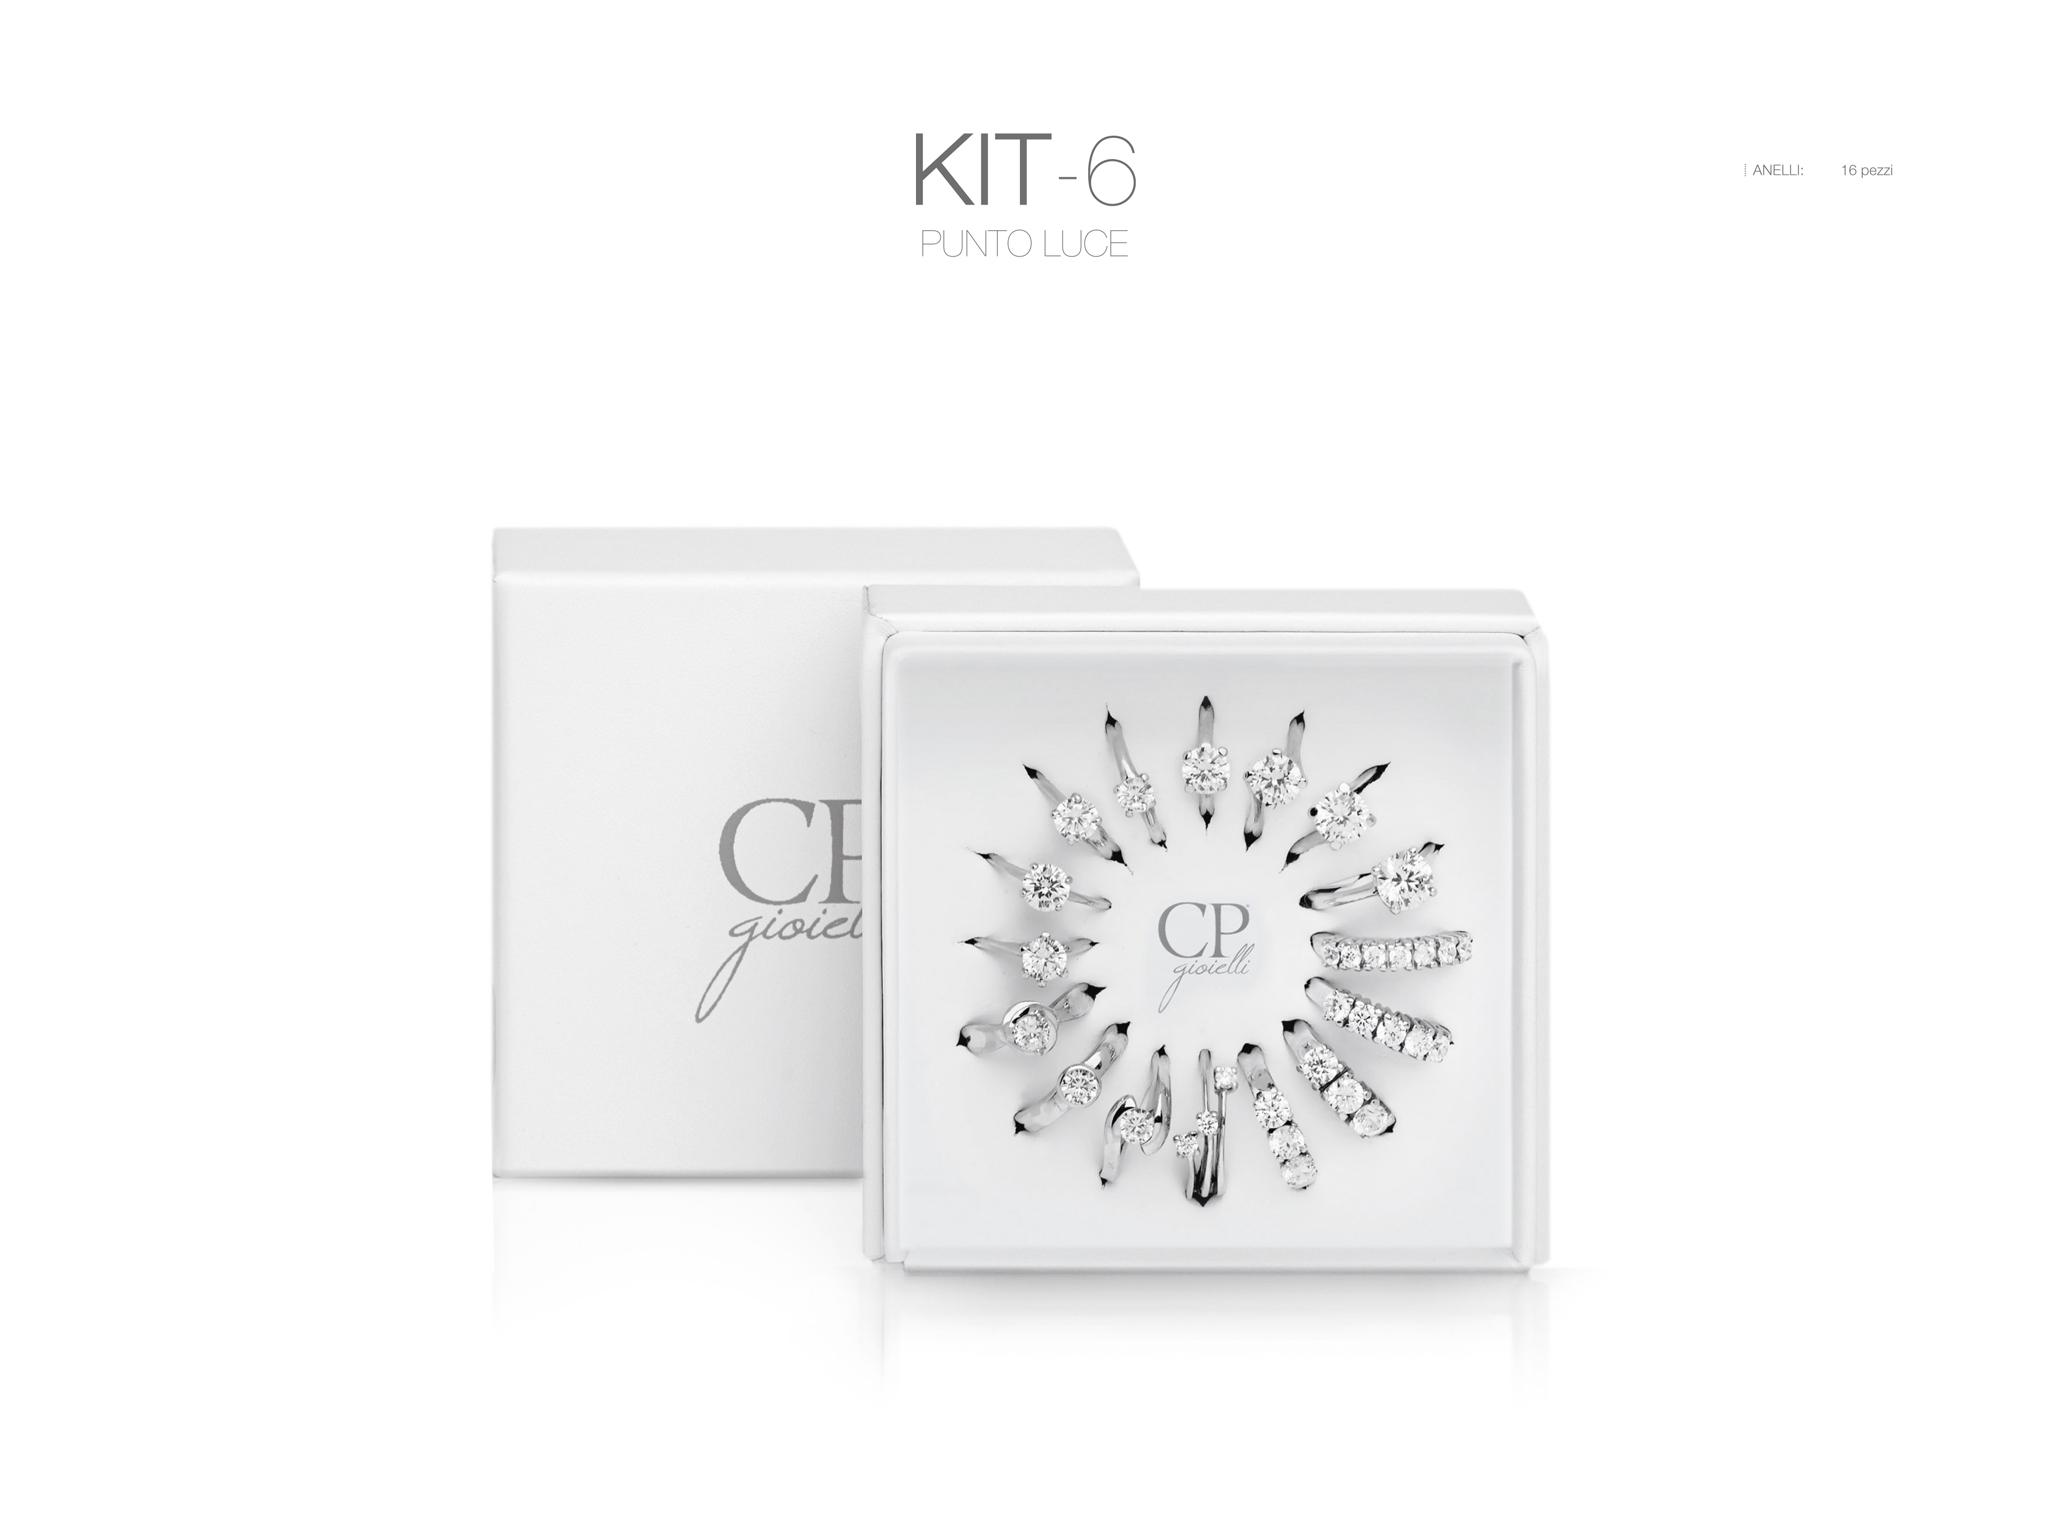 kit_argento_2-0_2016_pagina_25_app